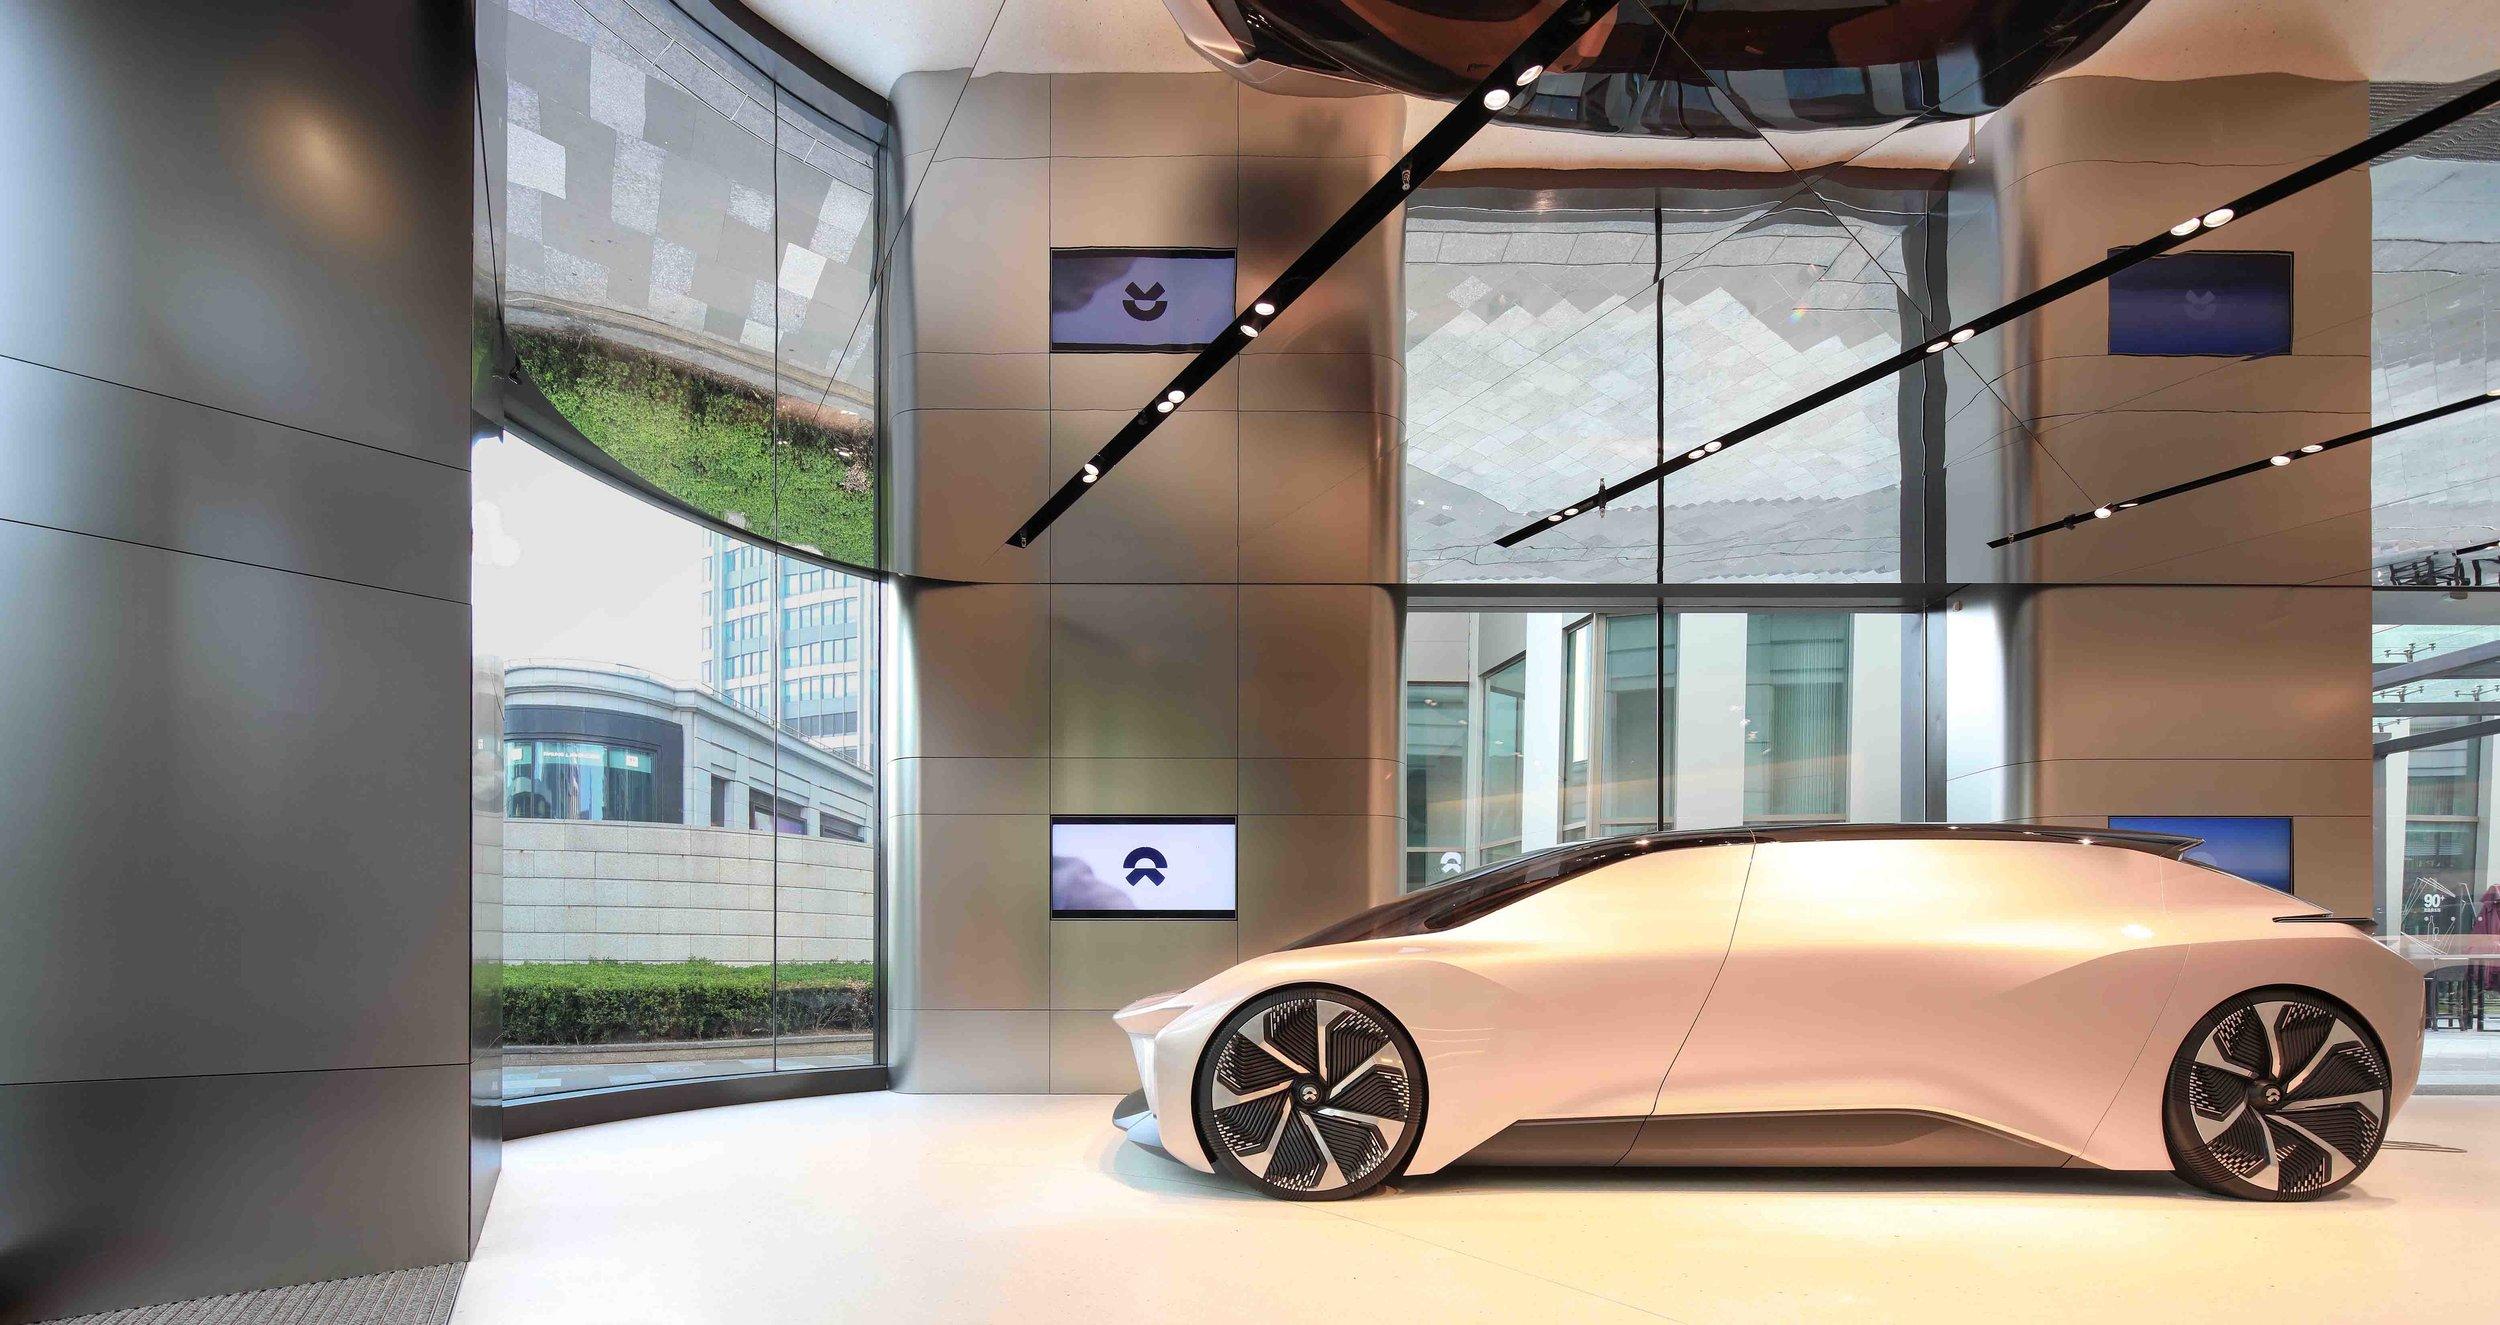 raams-architecture-studio-design-german-roig-garcia-architect-electric-car-coche-electrico-shanghai-china-nio-house-SHL_NIO-Showroom_@RawVision_21.jpg